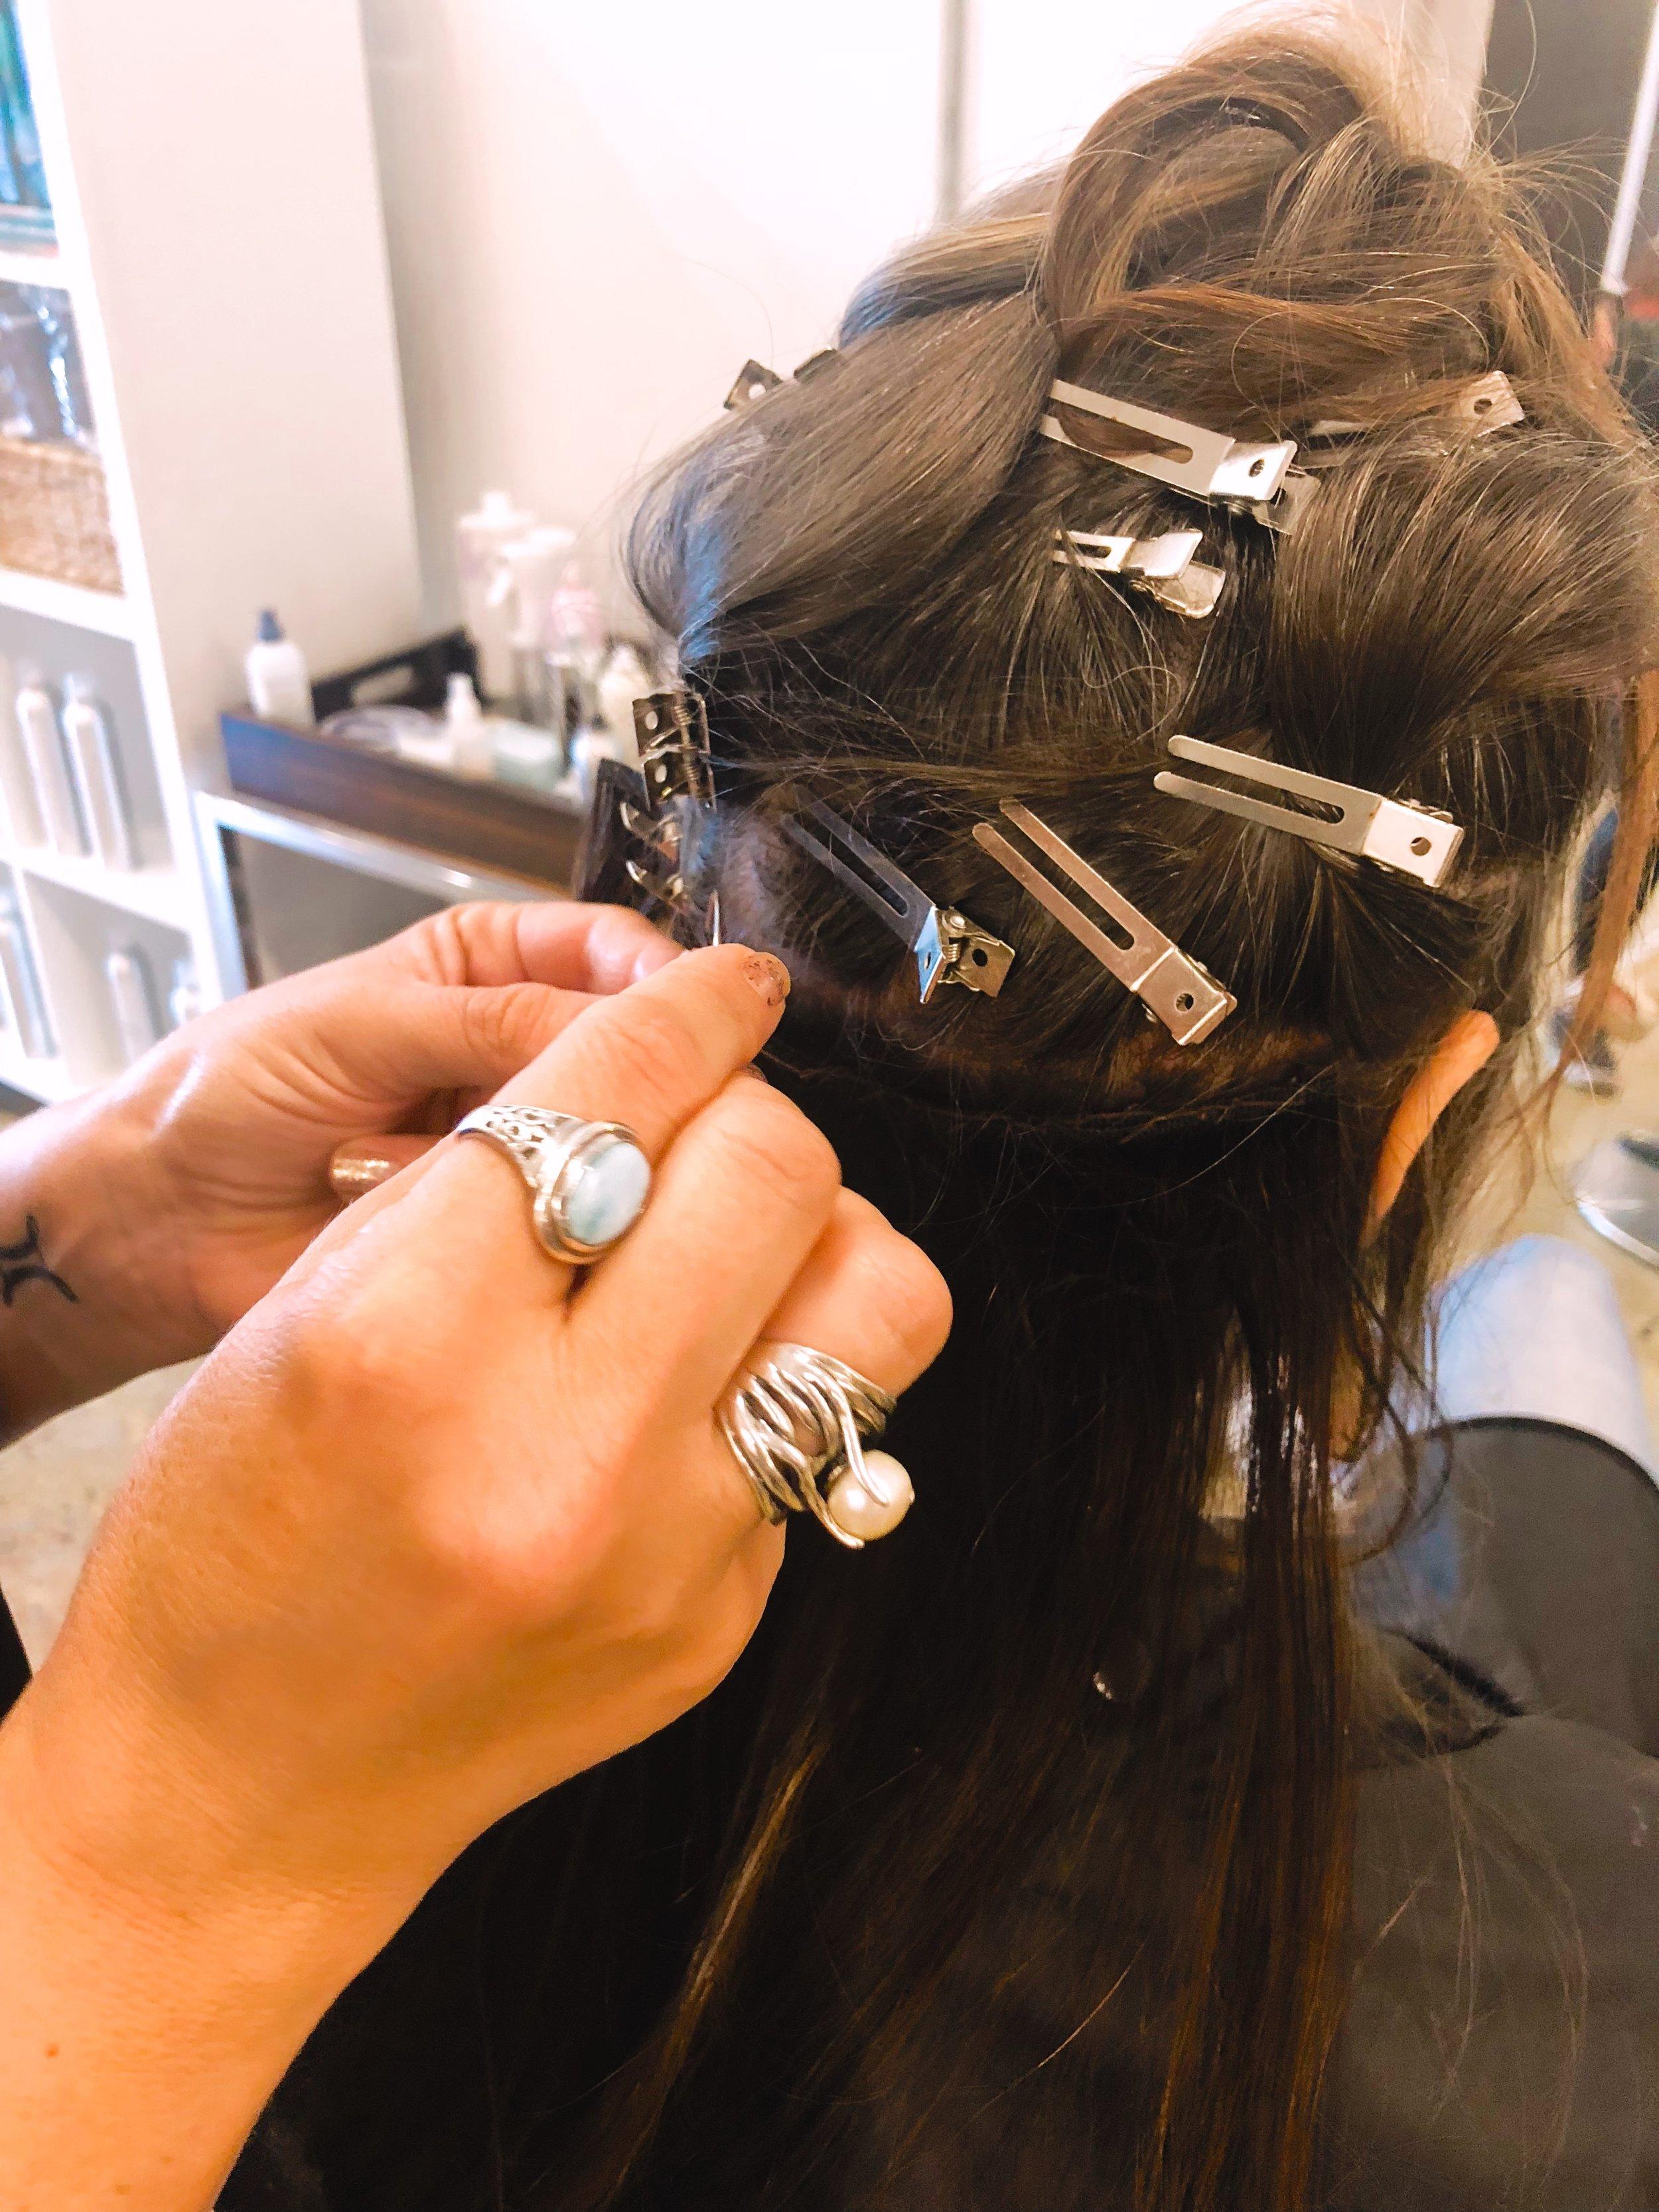 Pepper weaving hair extensions into Brenna's hair